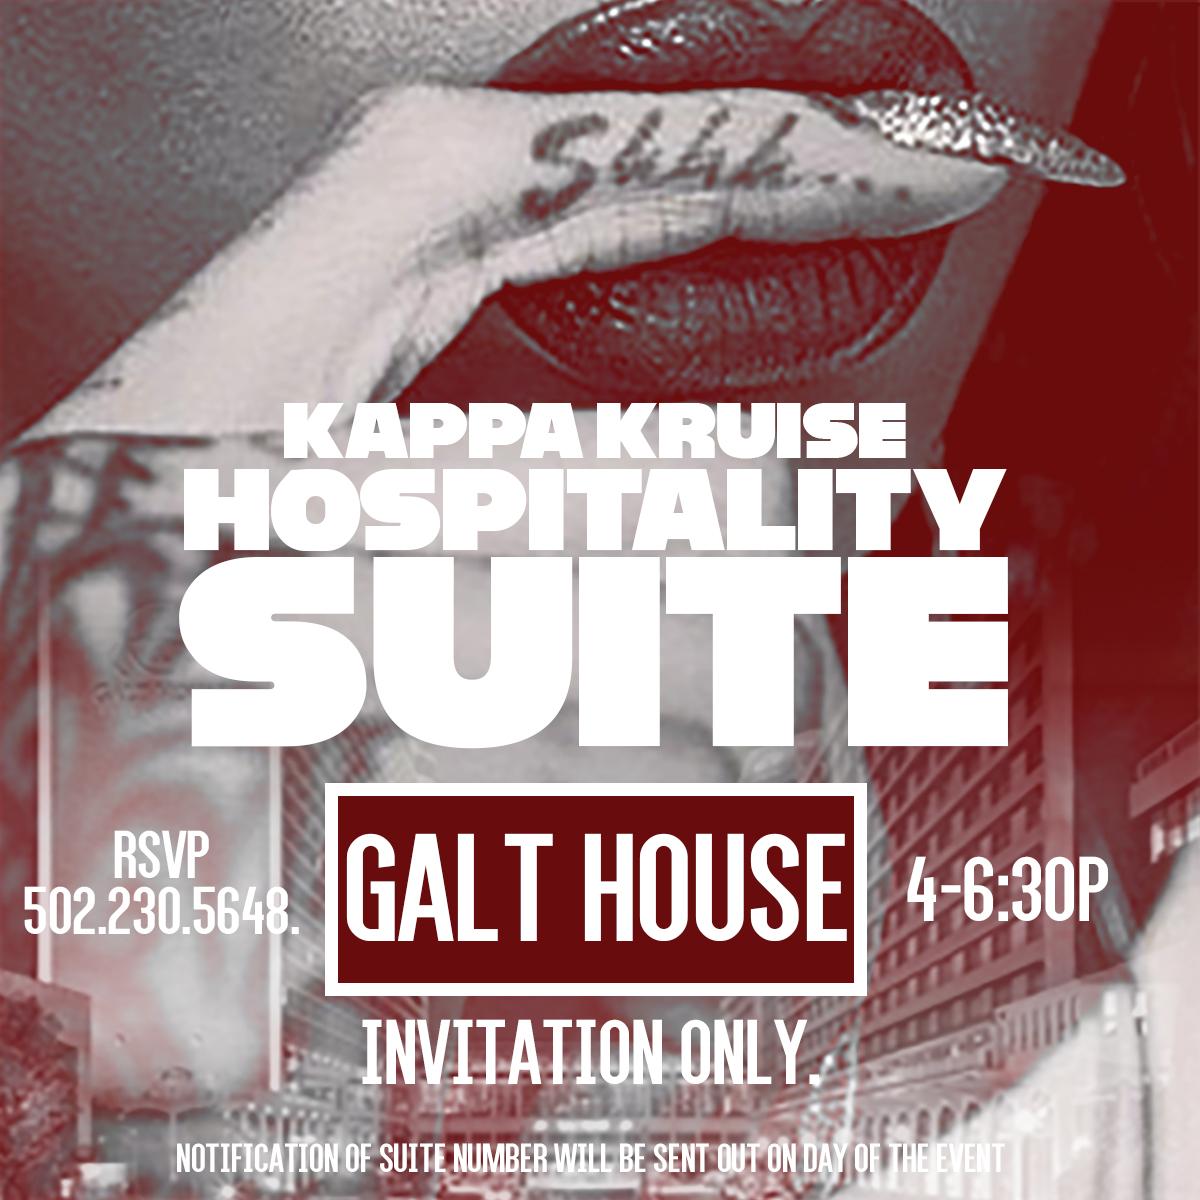 Copy of Kappa Krusie Hospitality Suite flyer